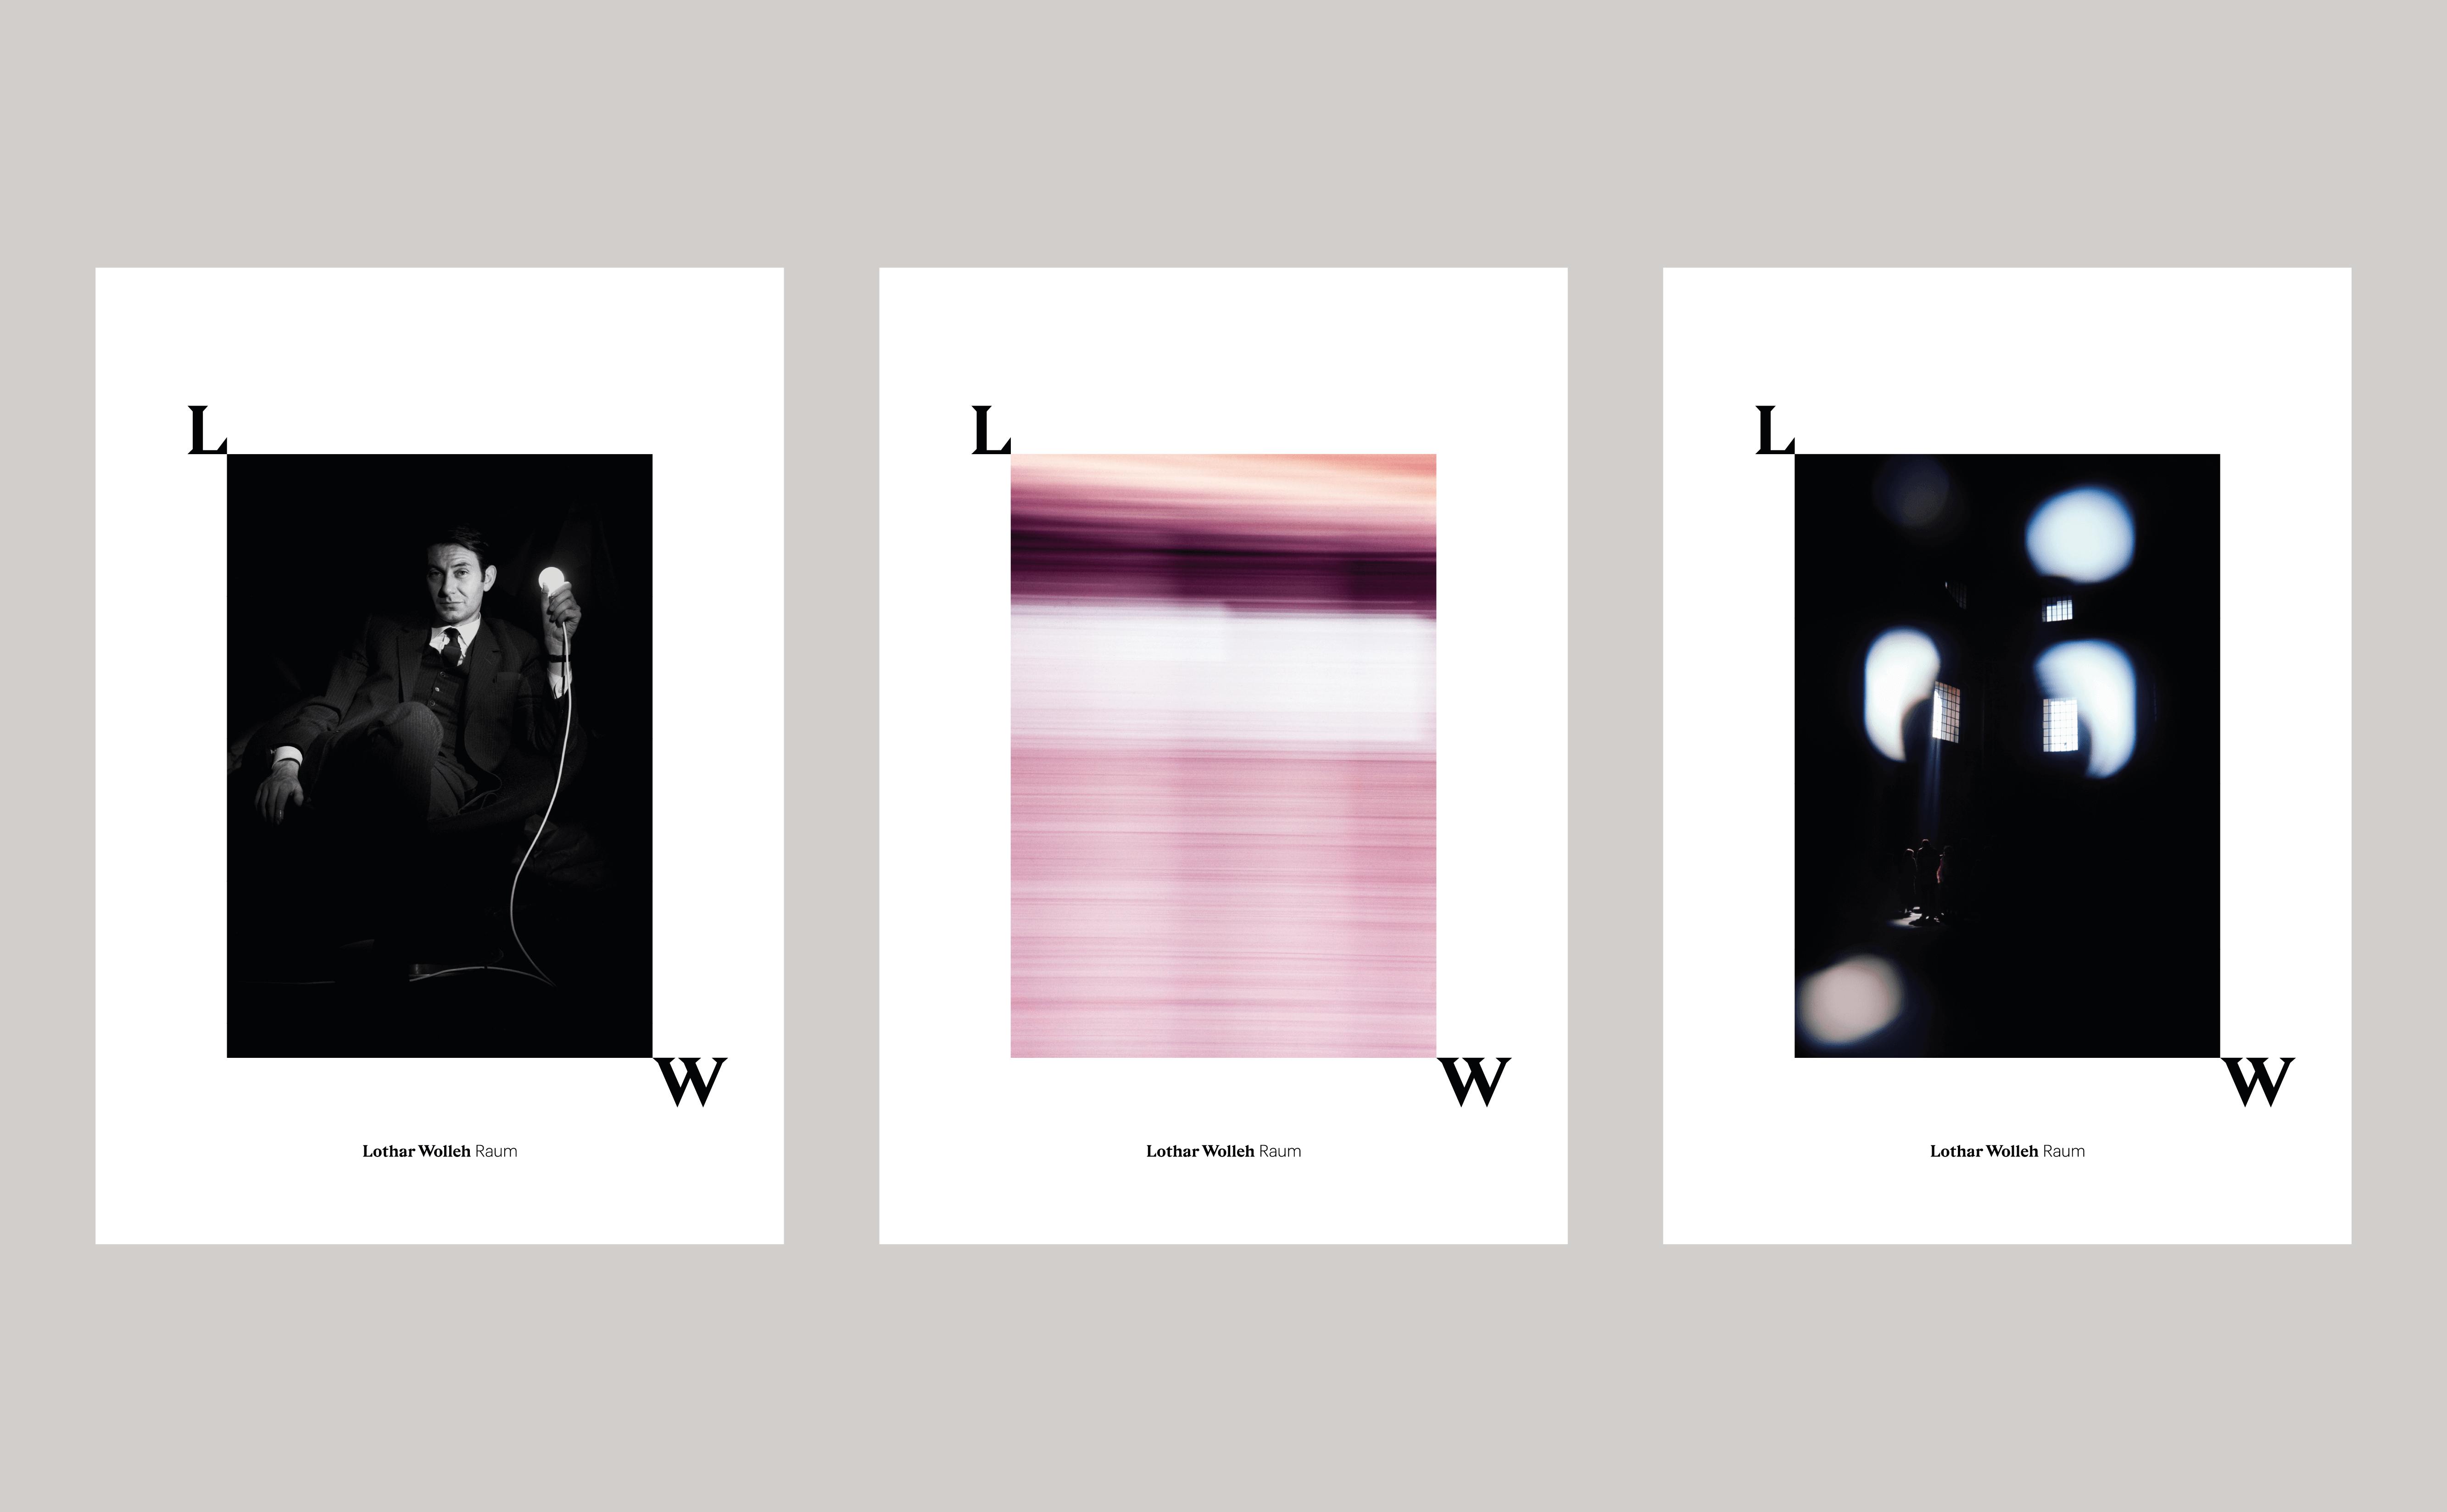 SHVI-Wolleh-infocard-01